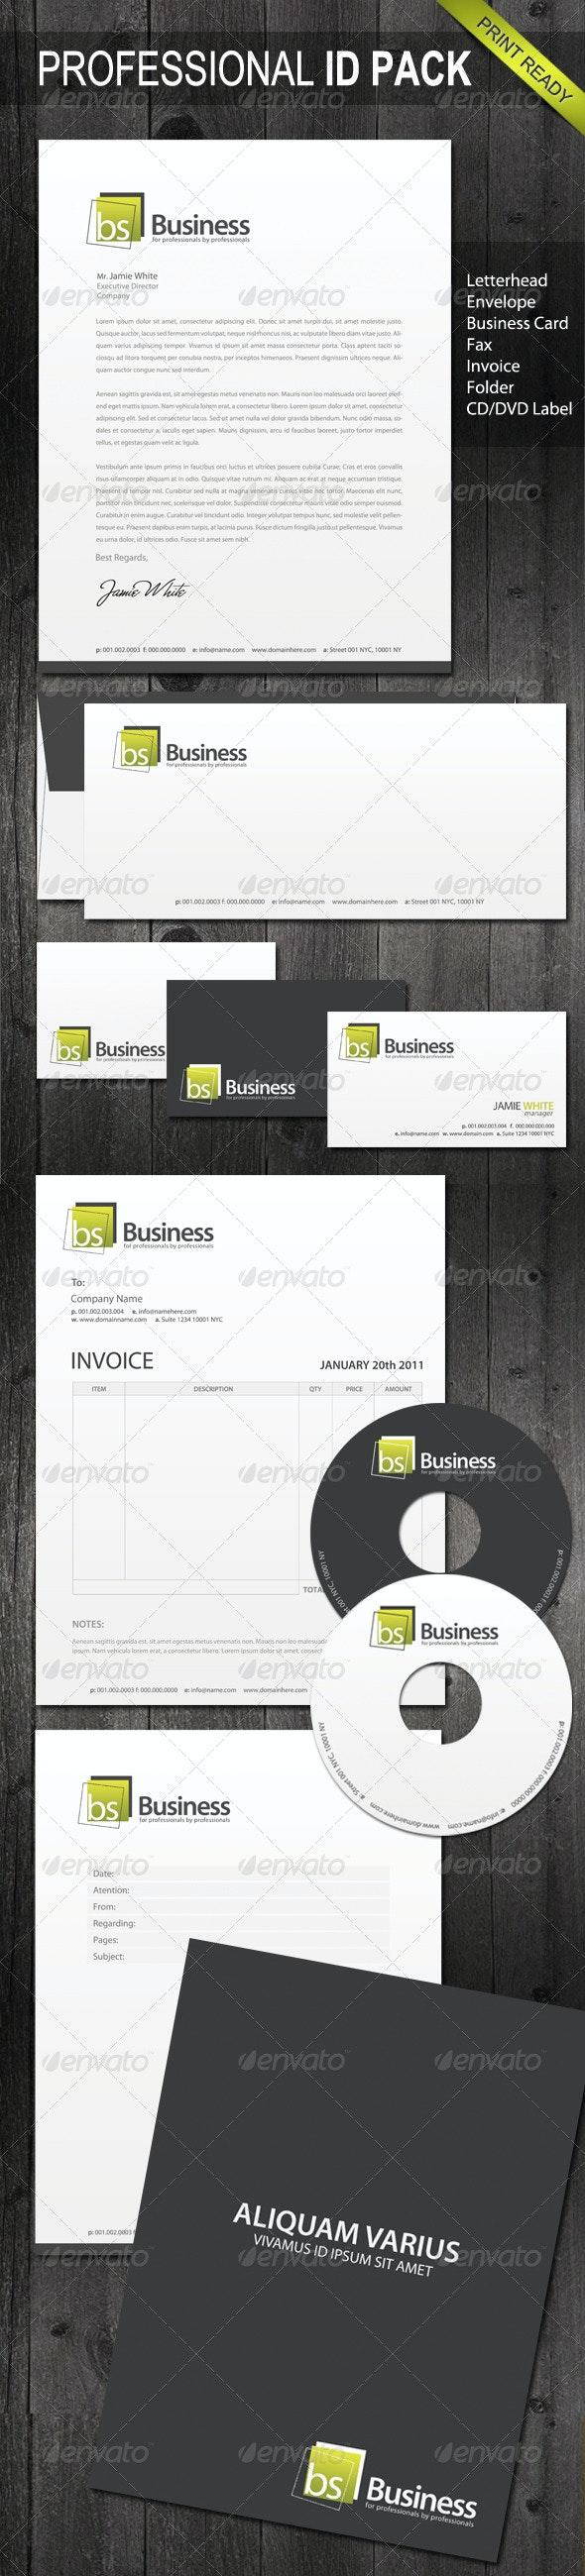 Professional Identity 05 - Stationery Print Templates